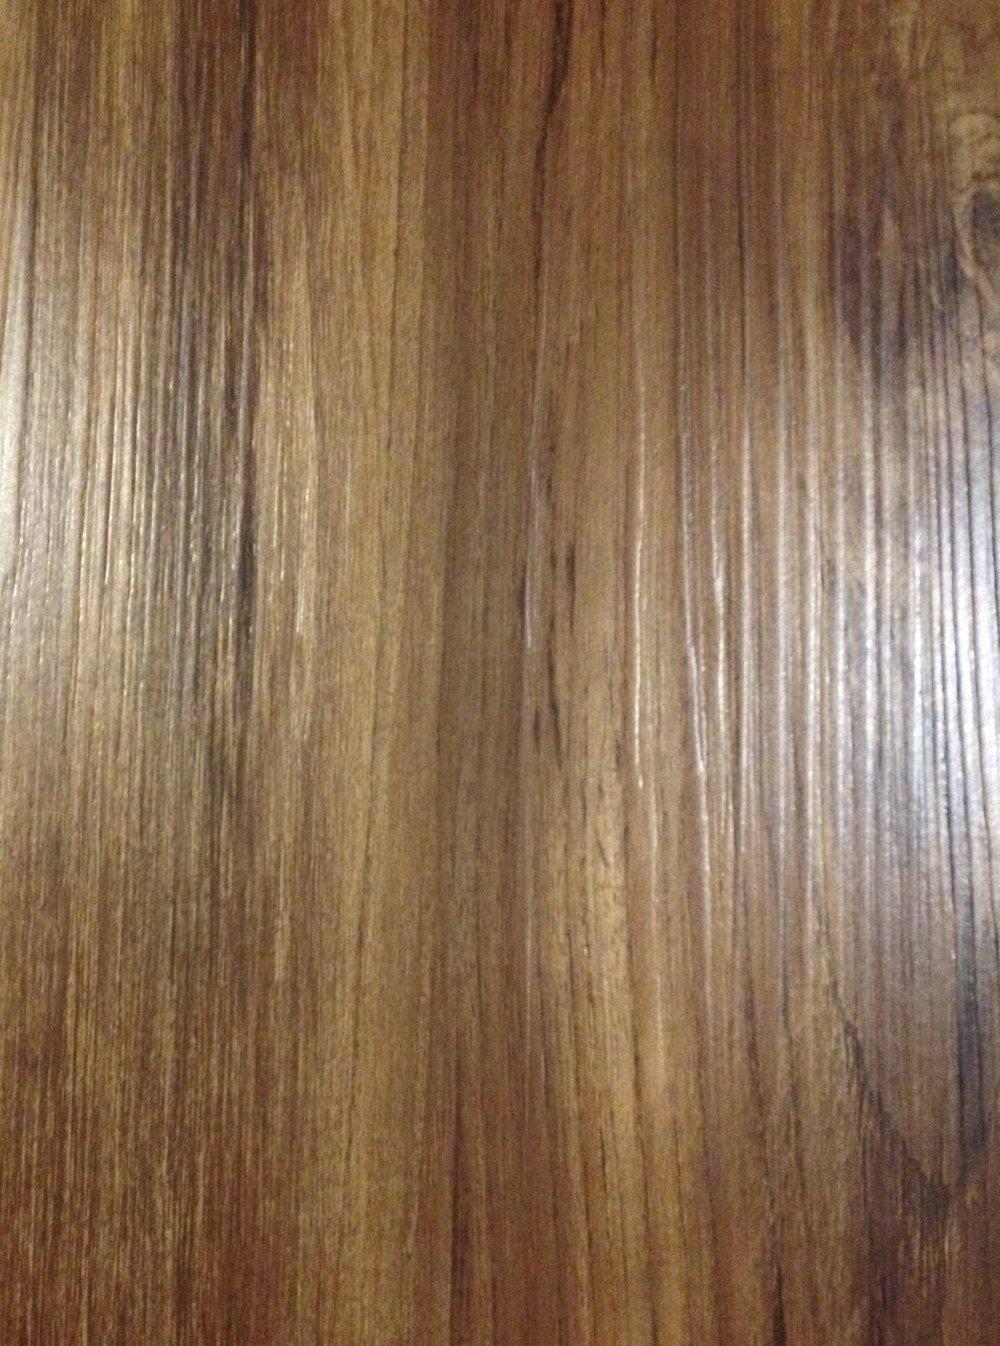 Shaw-P-Burmese Oak